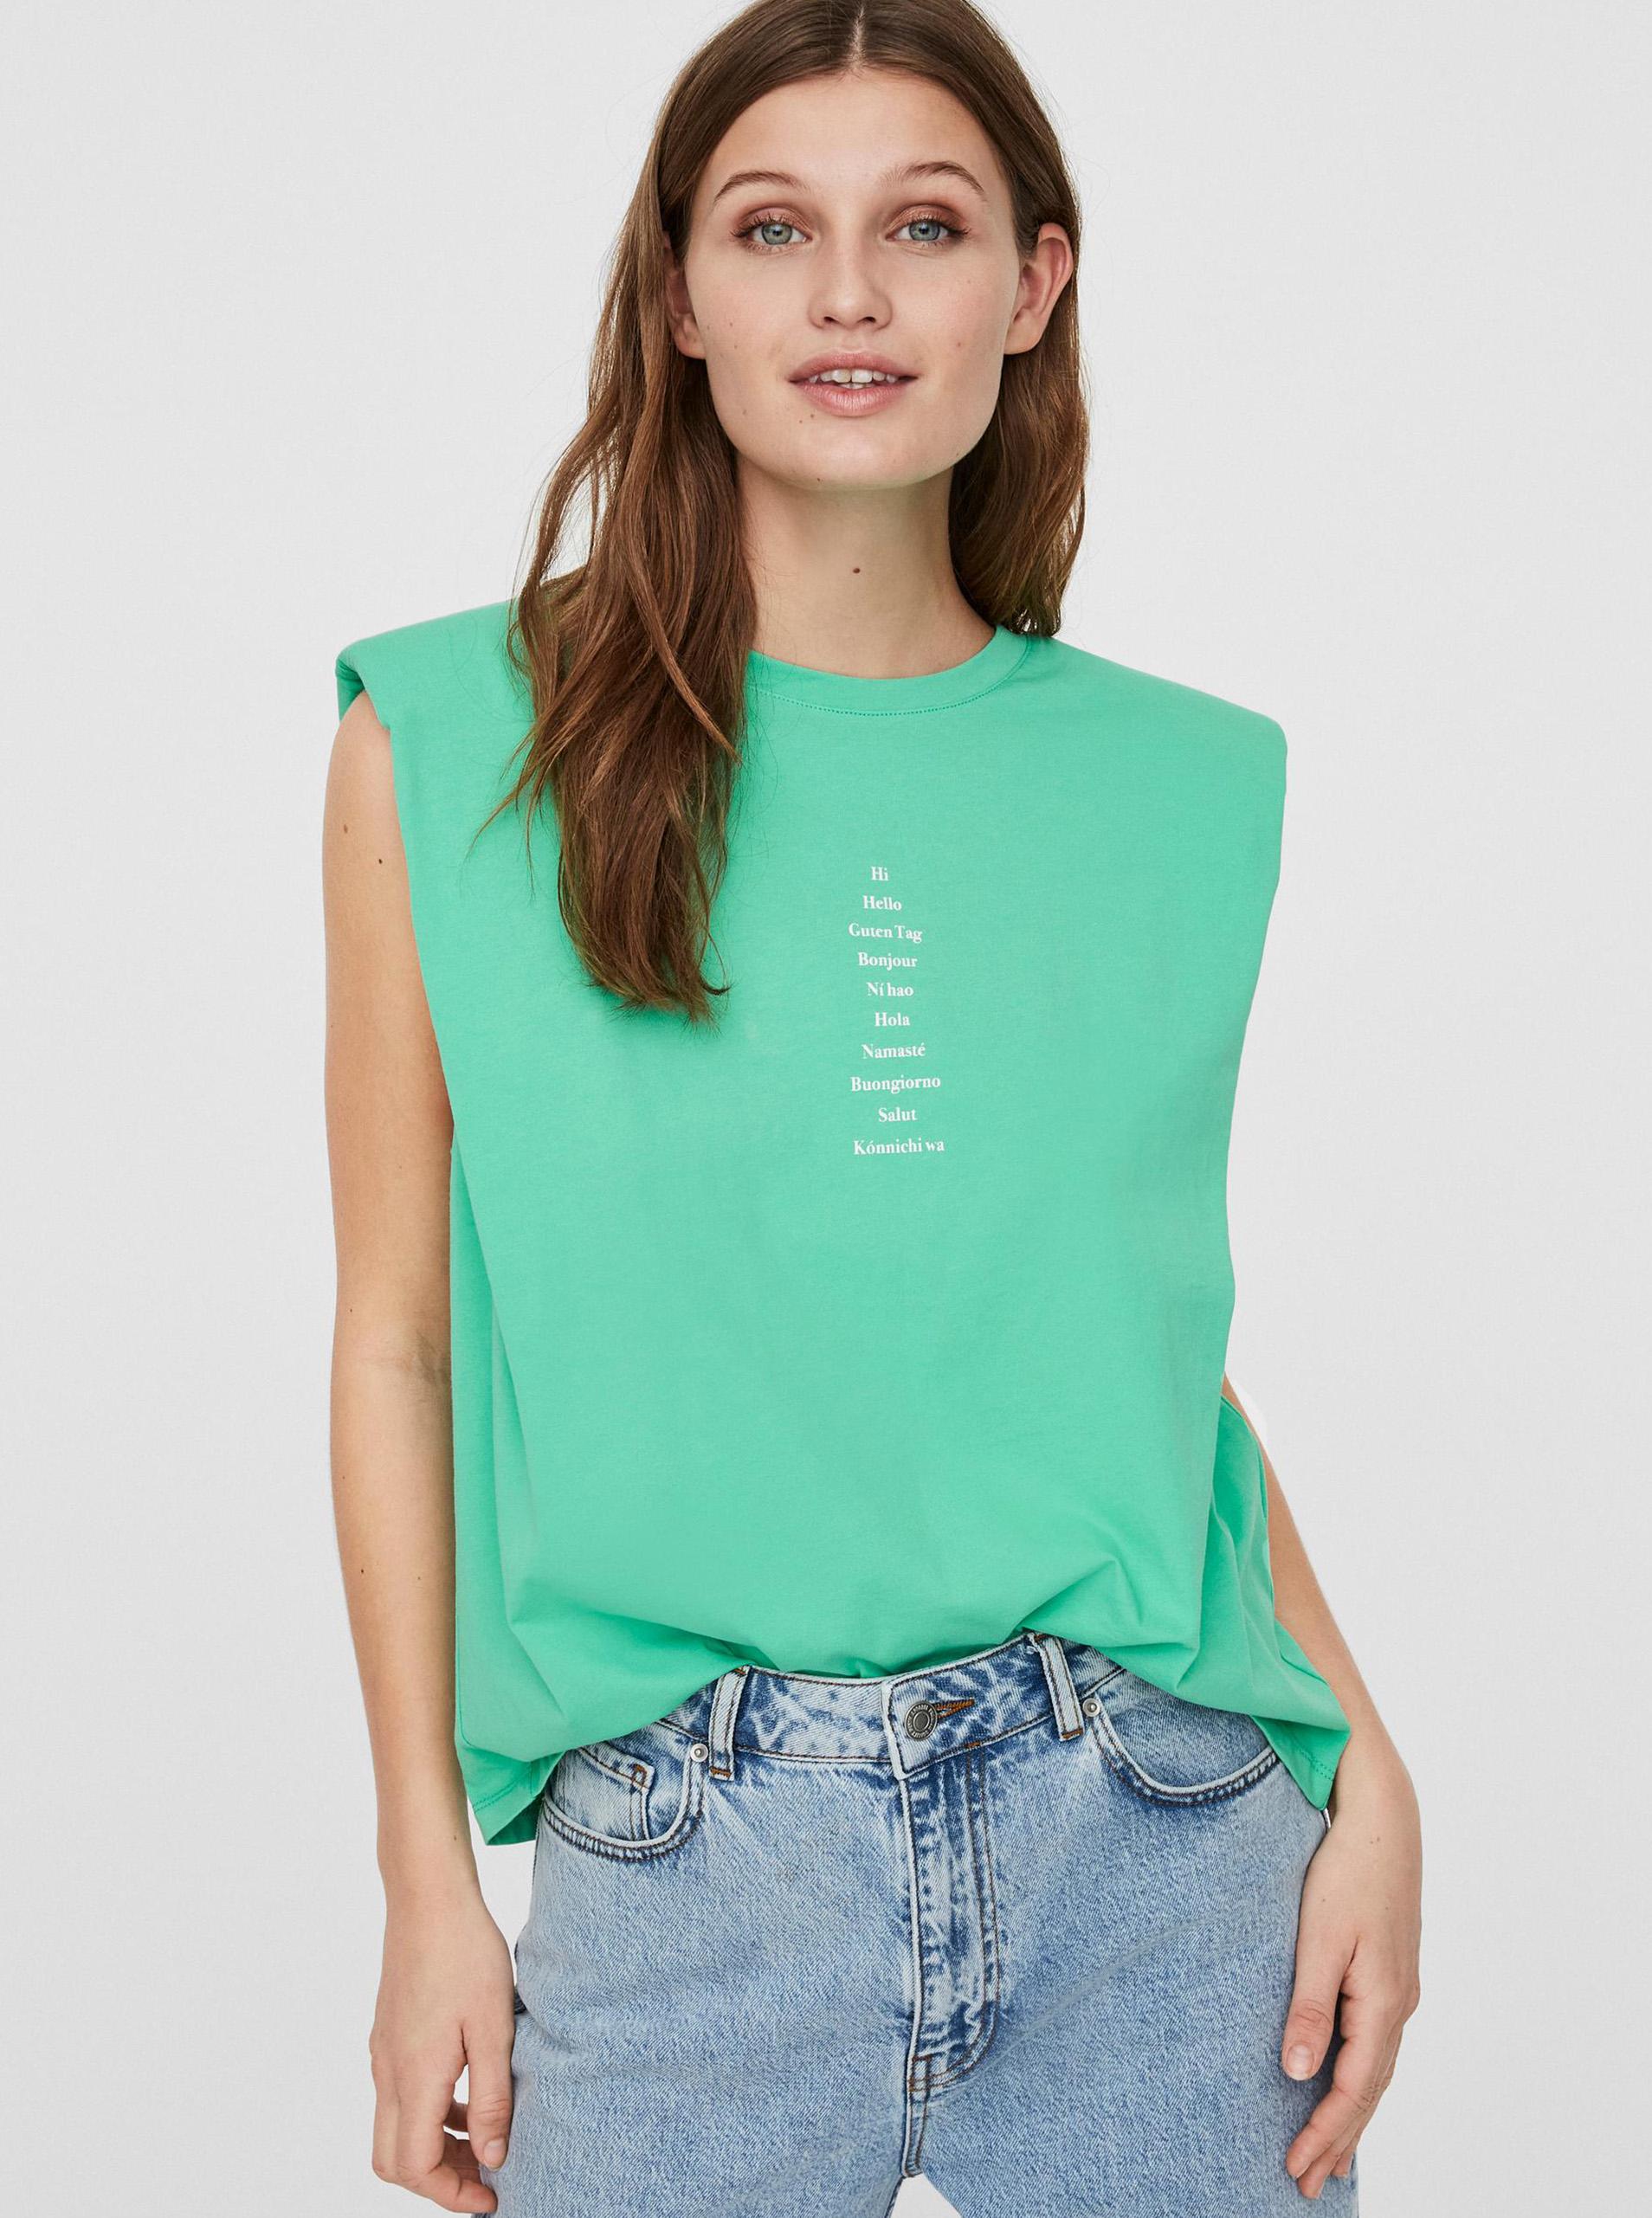 Vero Moda verzi tricou Hollie